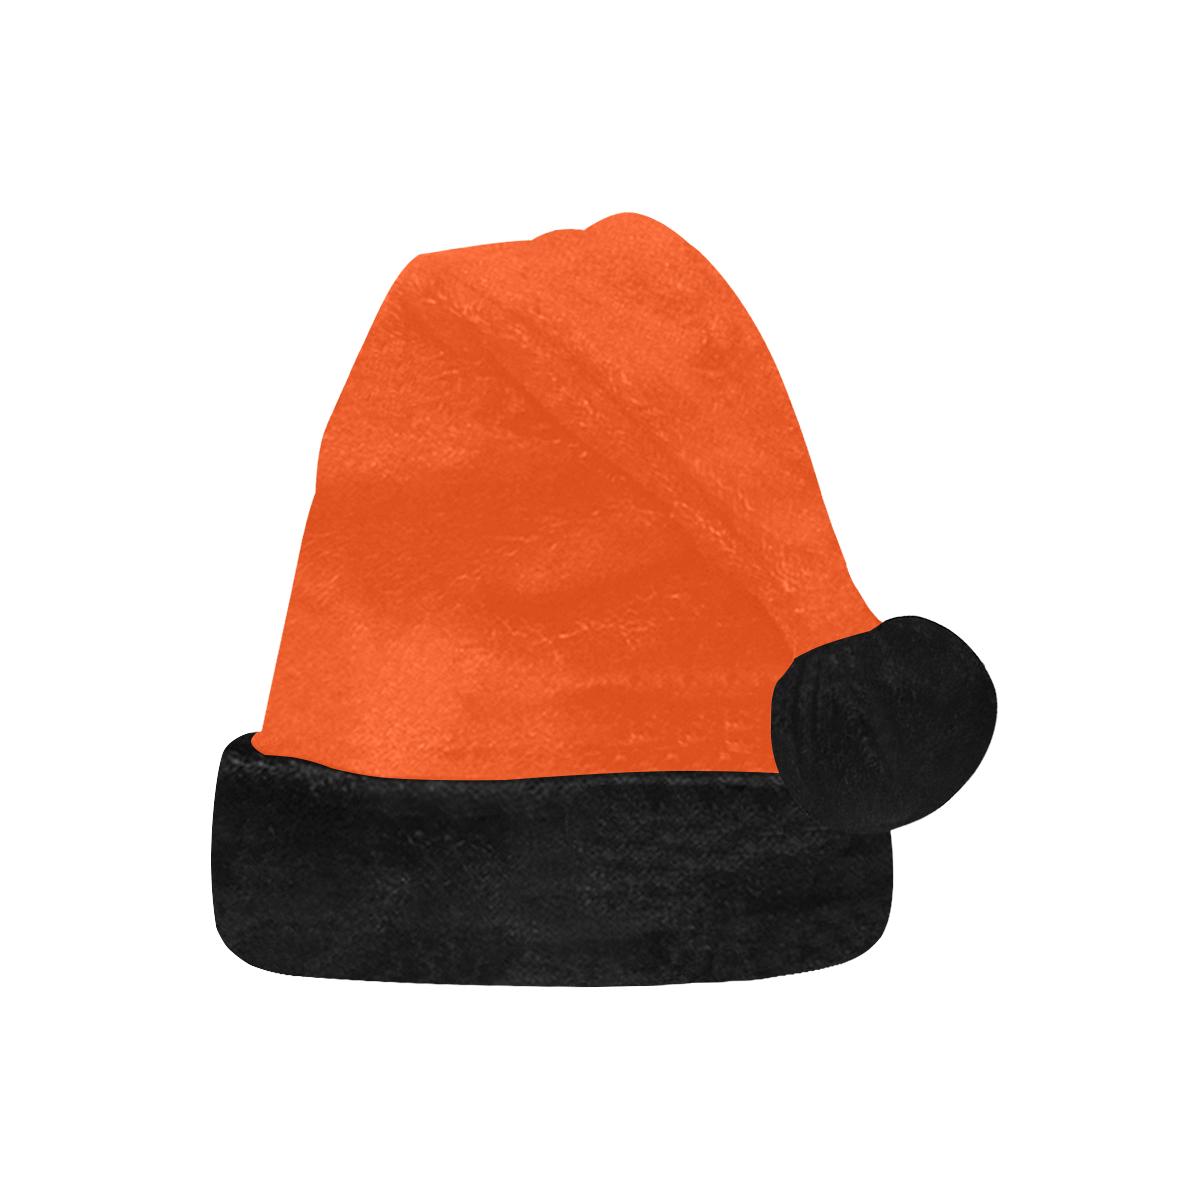 Team Colors Orange and Black Santa Hat